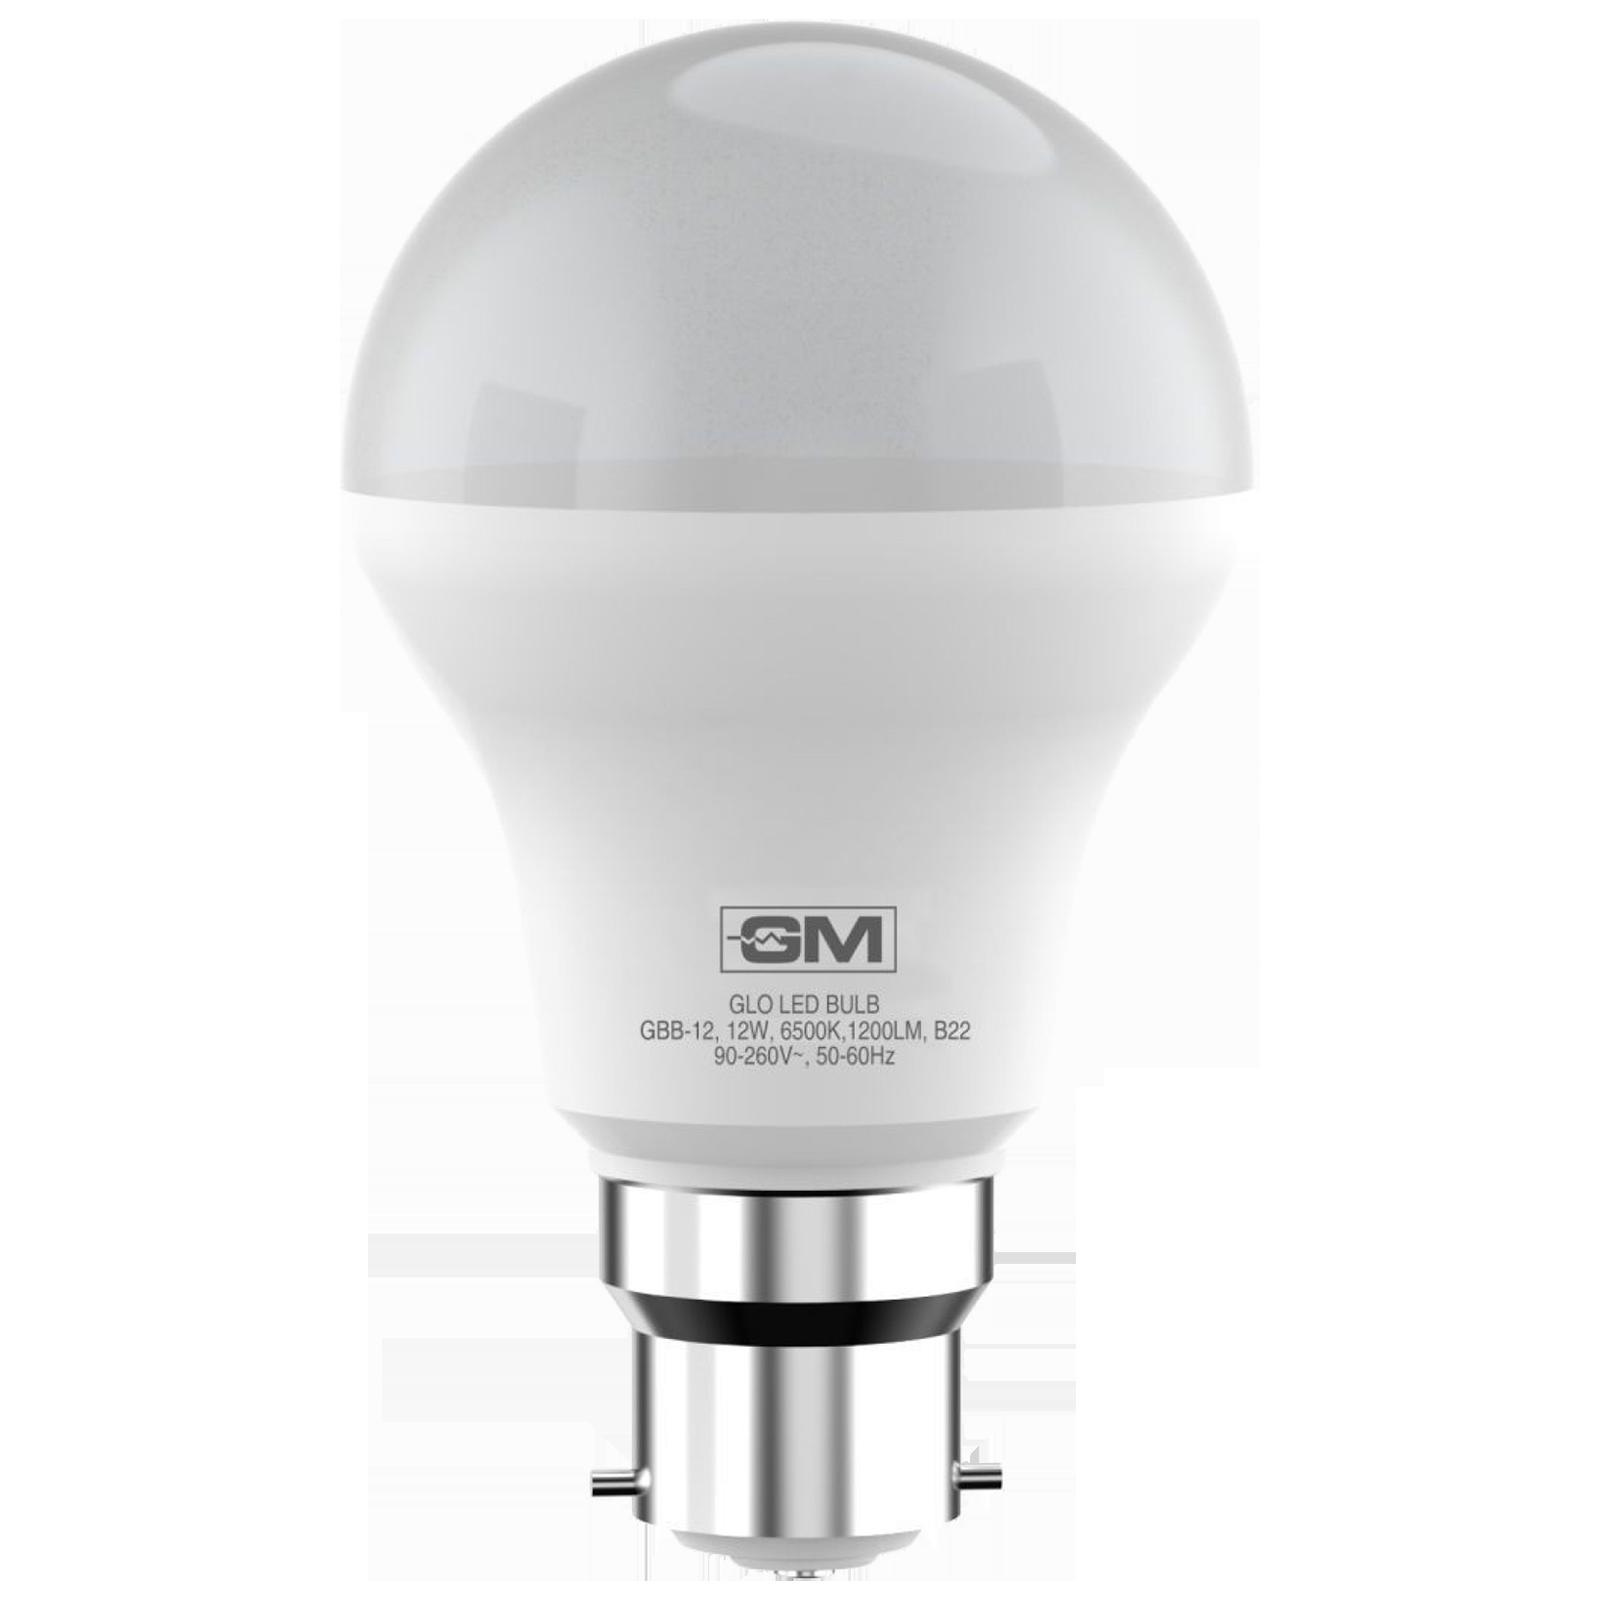 GM GLO 12 Watts Electric Powered LED Bulb (1200 Lumens, GBB-12-6.5K-6500K, White)_1